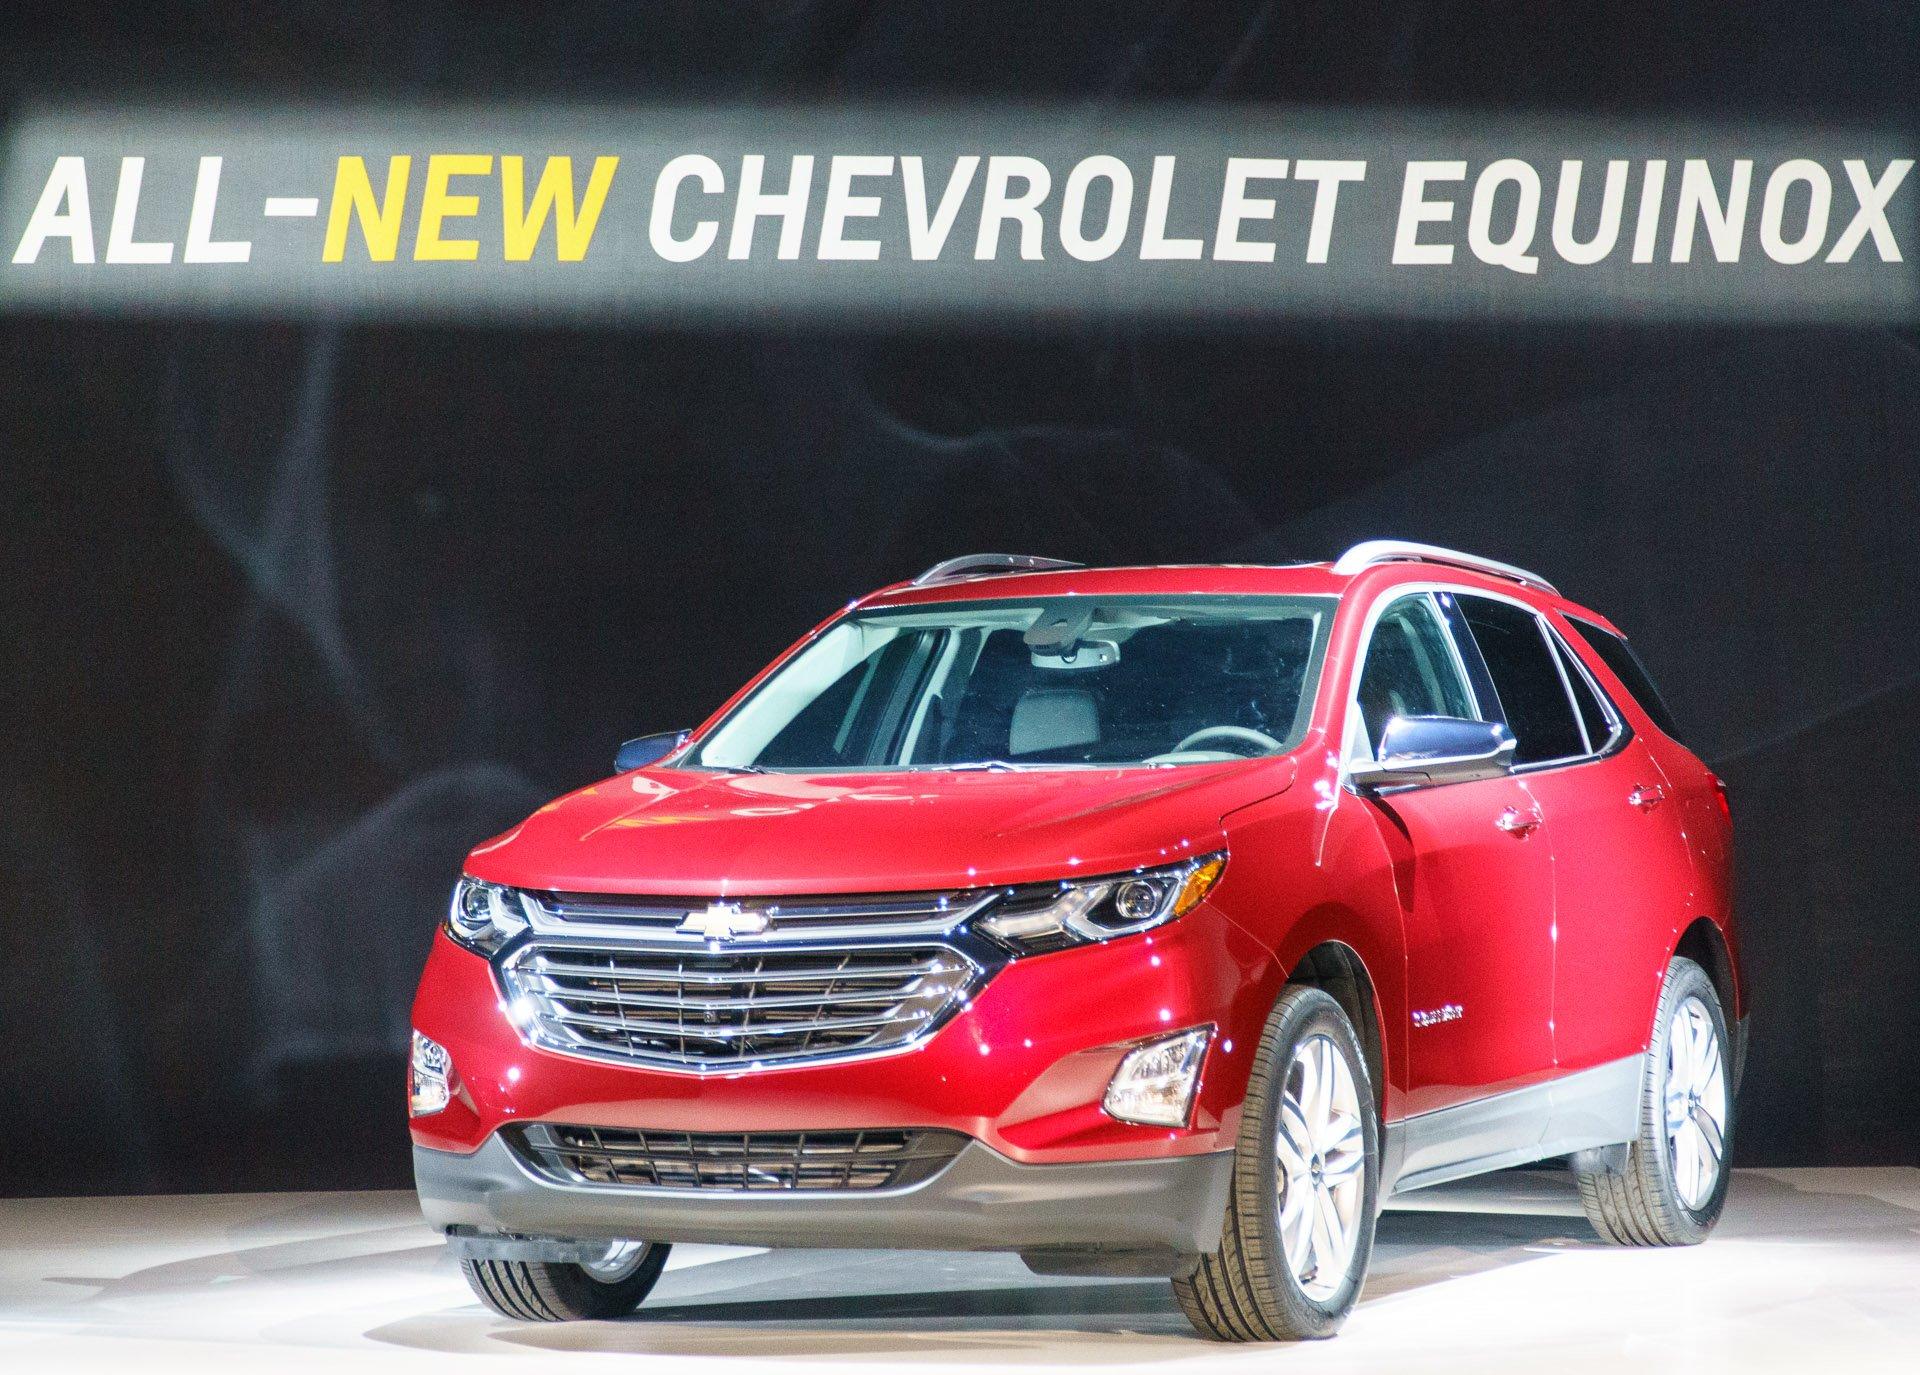 2018 Chevrolet Equinox: Bigger on the Inside - 95 Octane